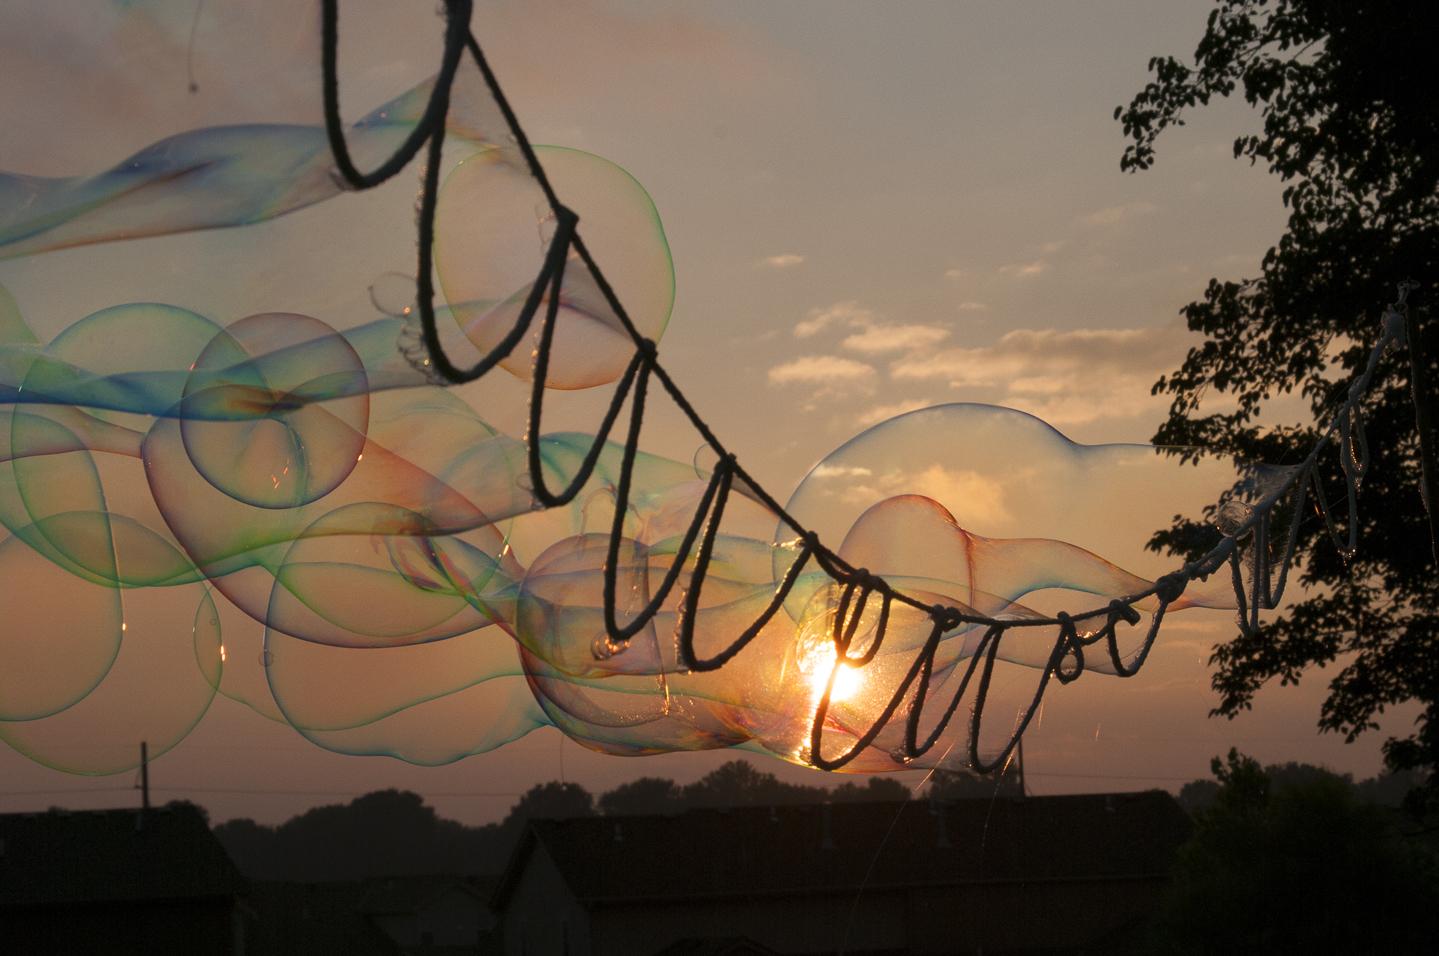 7' Galand at sunset